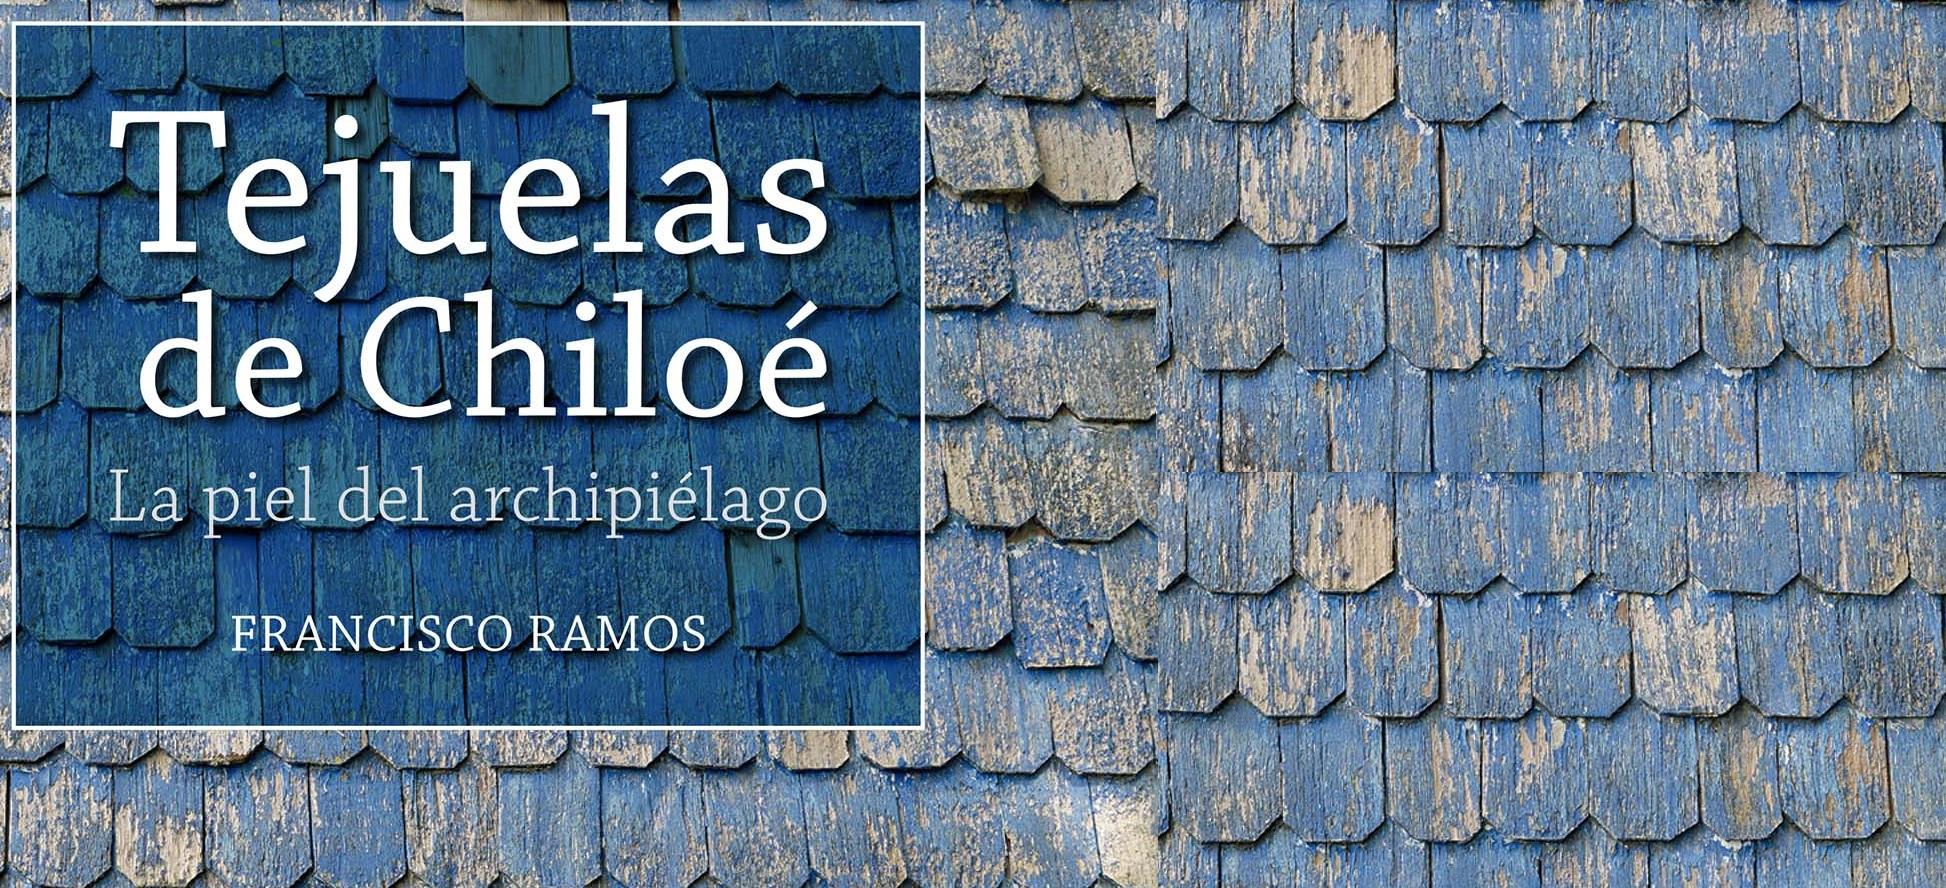 Tejuelas de Chiloé: La piel del archipiélago